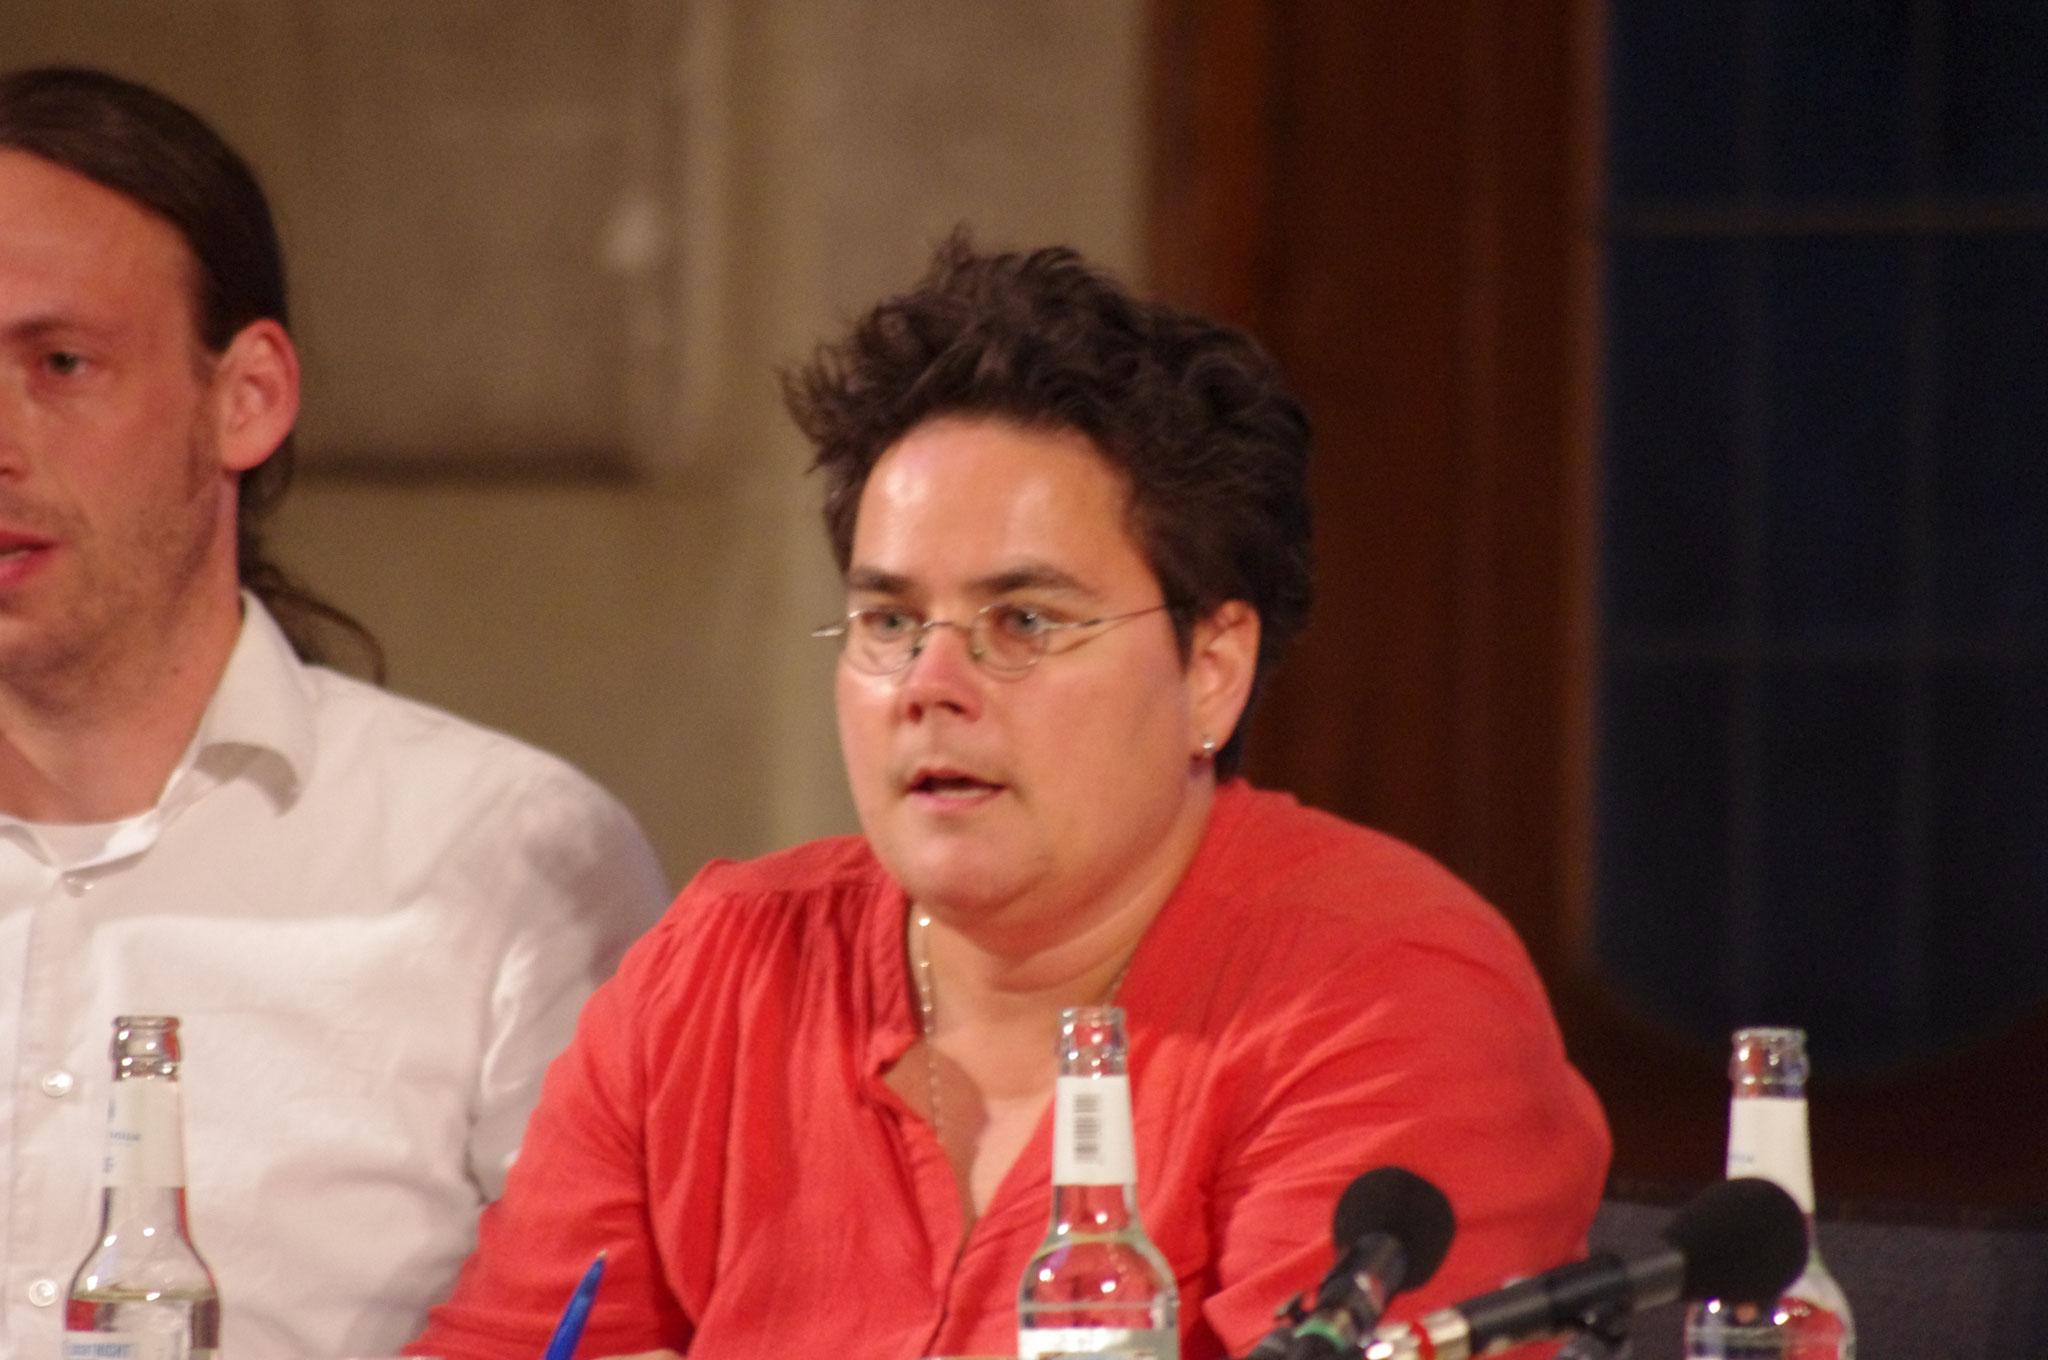 Grünen-Kandidaten Marianne Burkert-Eulitz